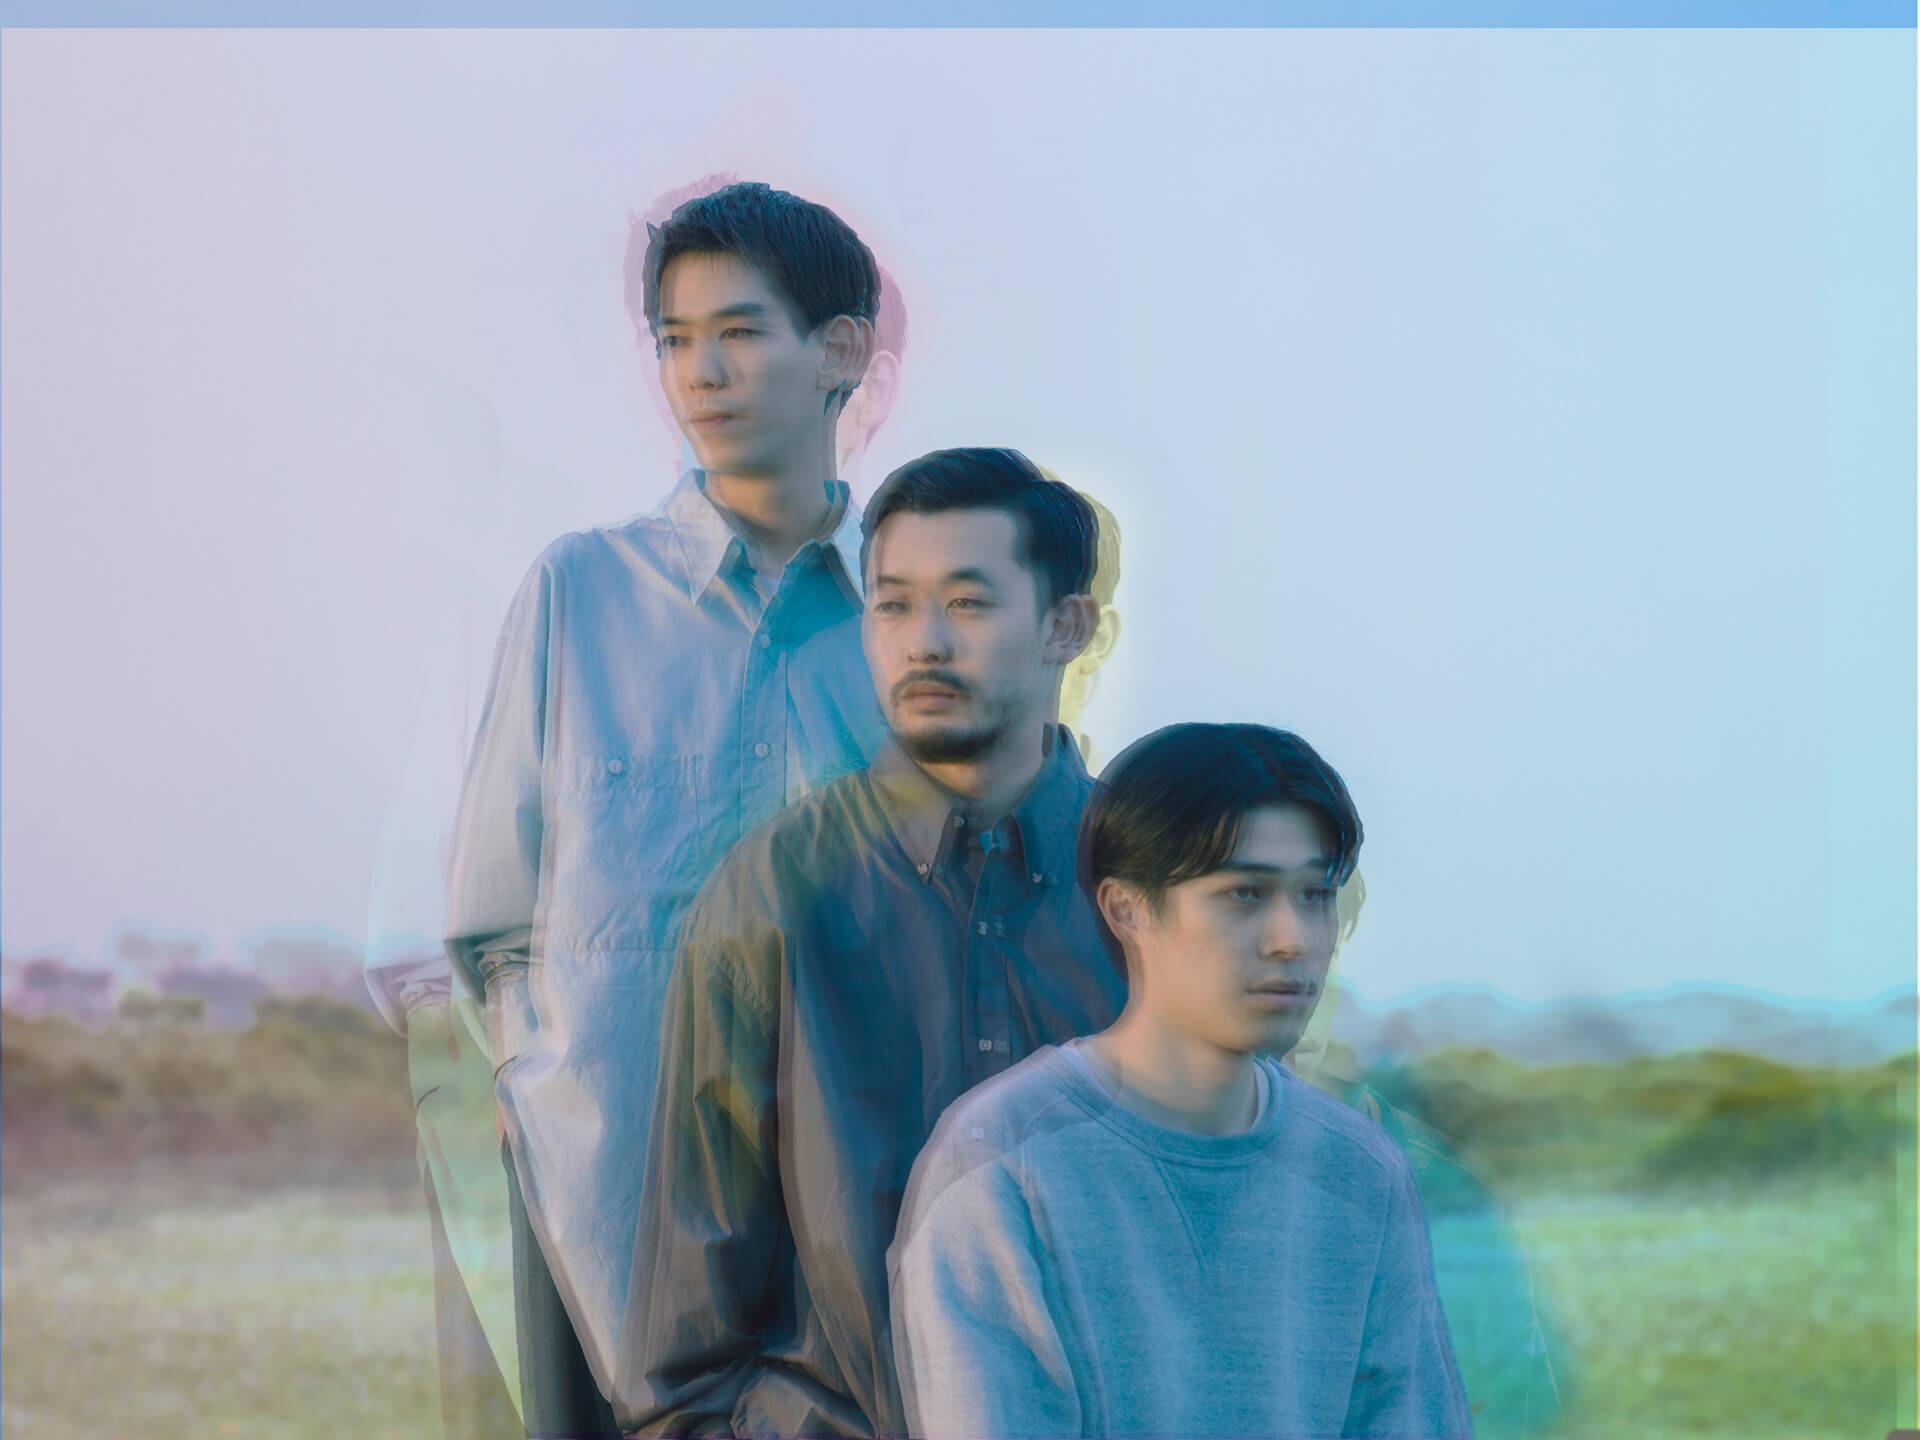 "D.A.N.の3rdアルバム『NO MOON』から先行配信シングル""No Moon""が解禁!木村太一監督のMVも公開決定 music210823_nomoon_3"